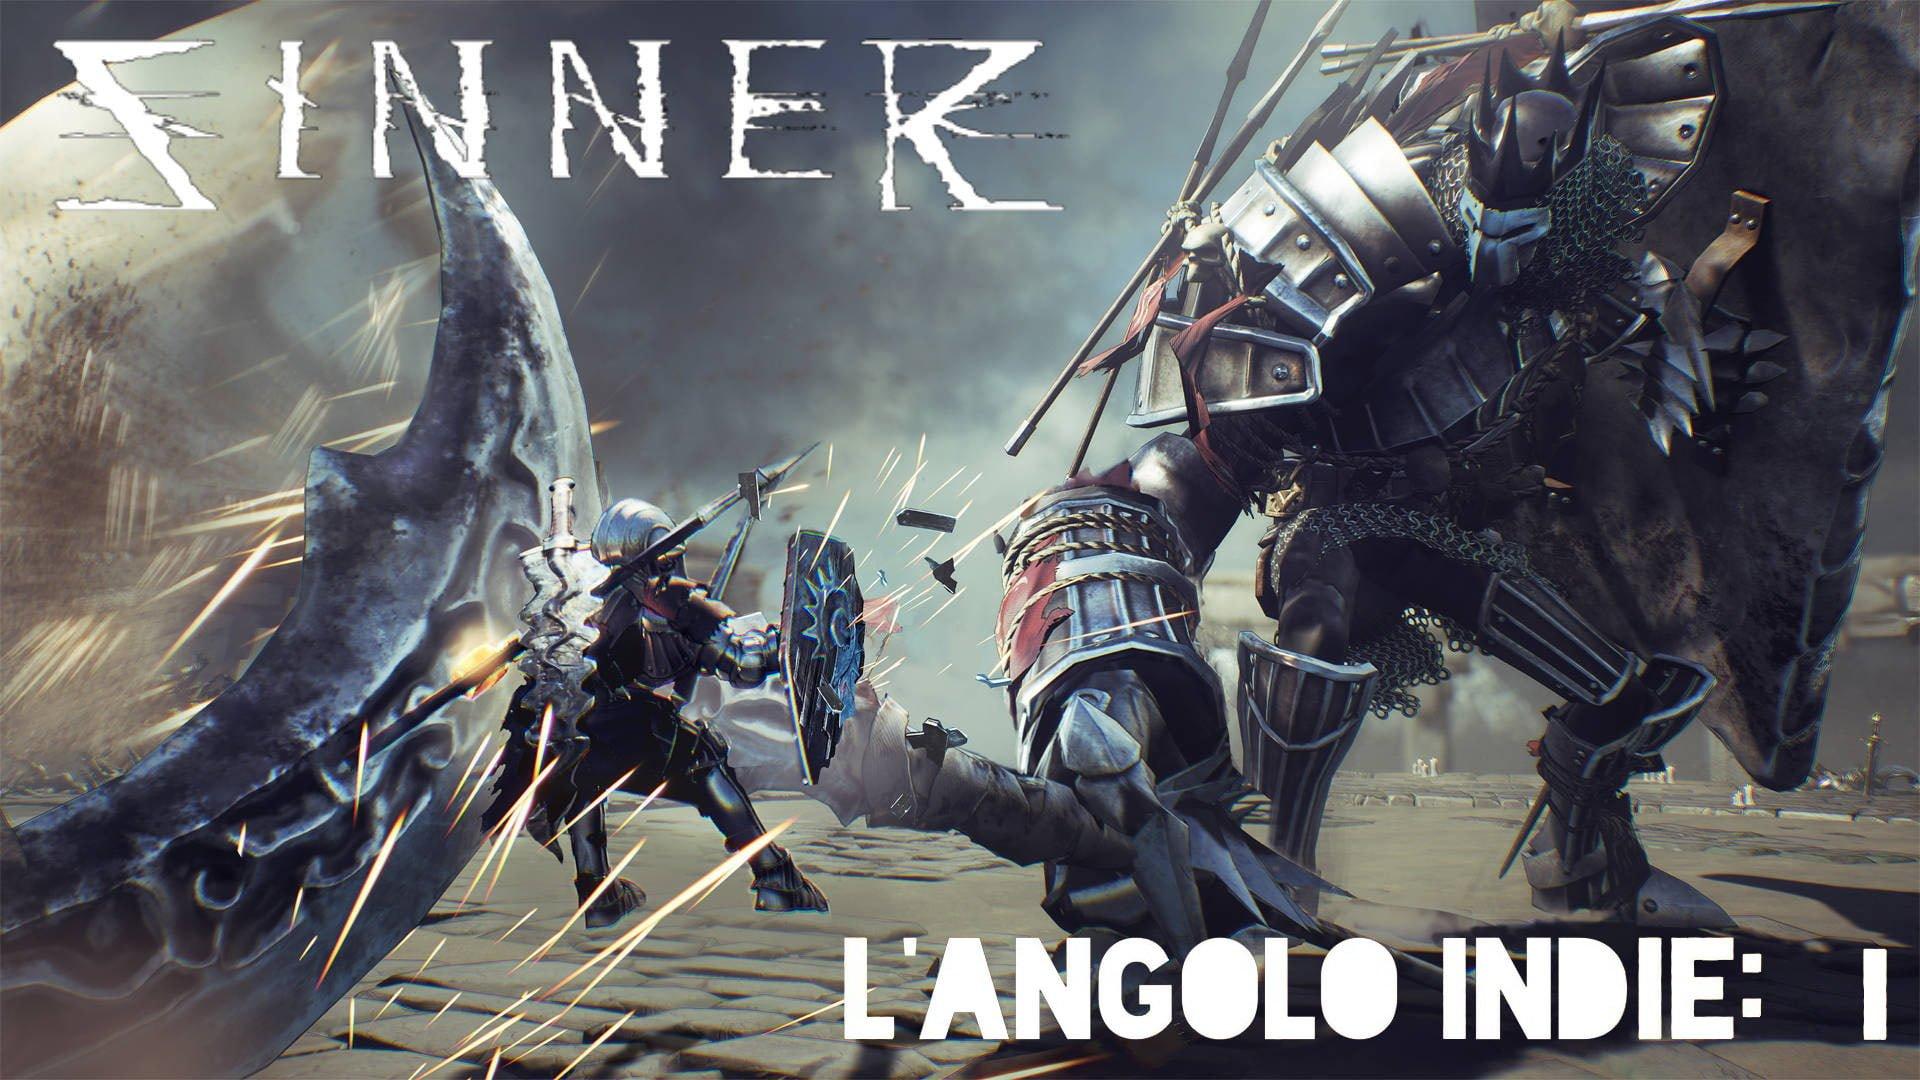 L'Angolo Indie- Sinner: Sacrifice For Redemption Recensione 1 - Hynerd.it